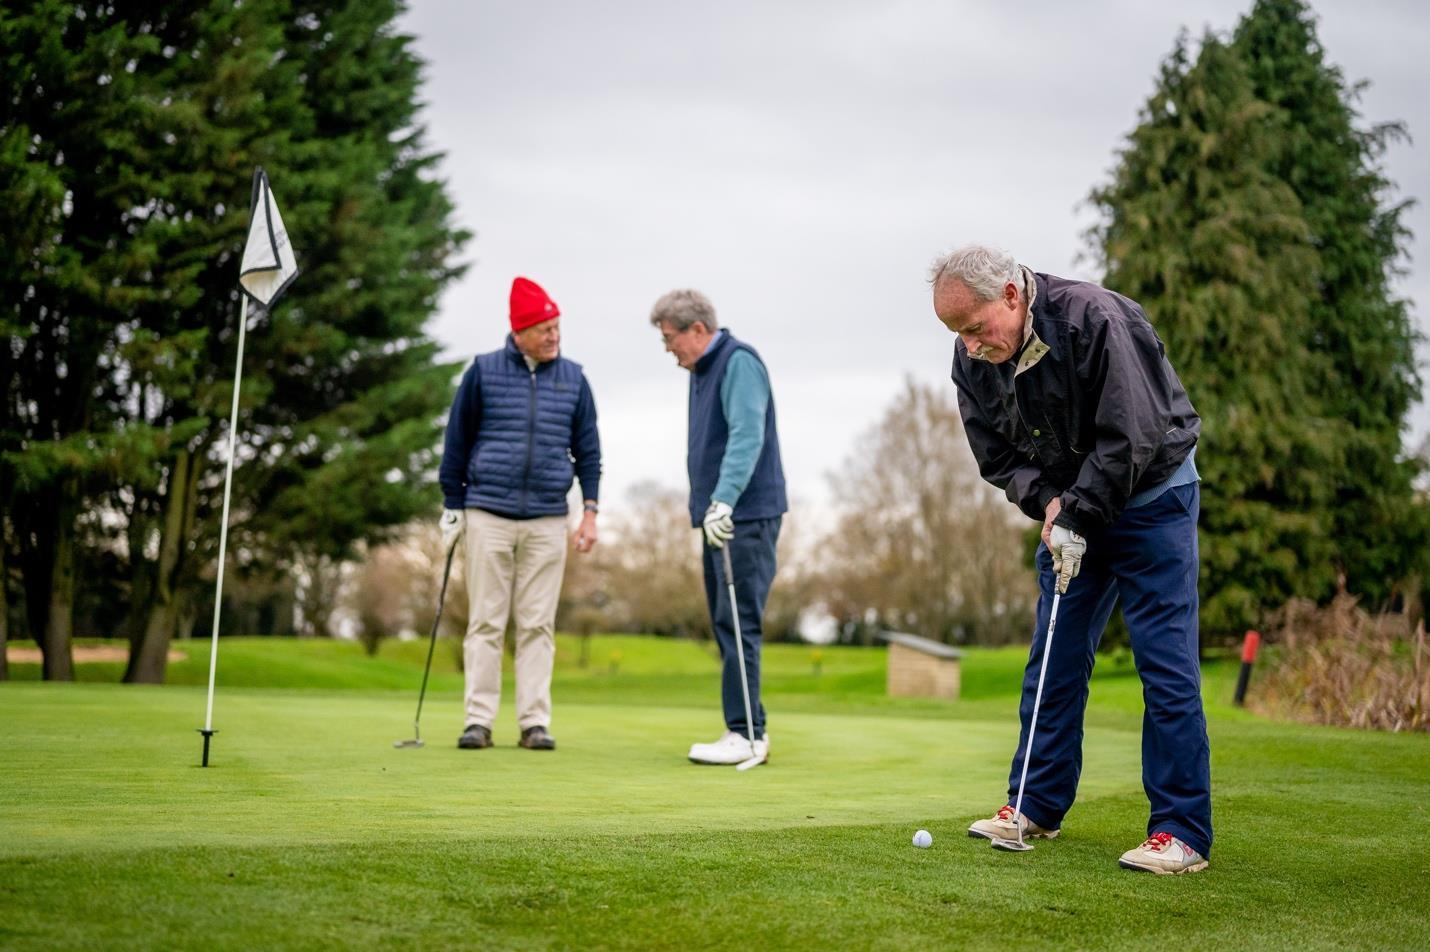 3 people golfing